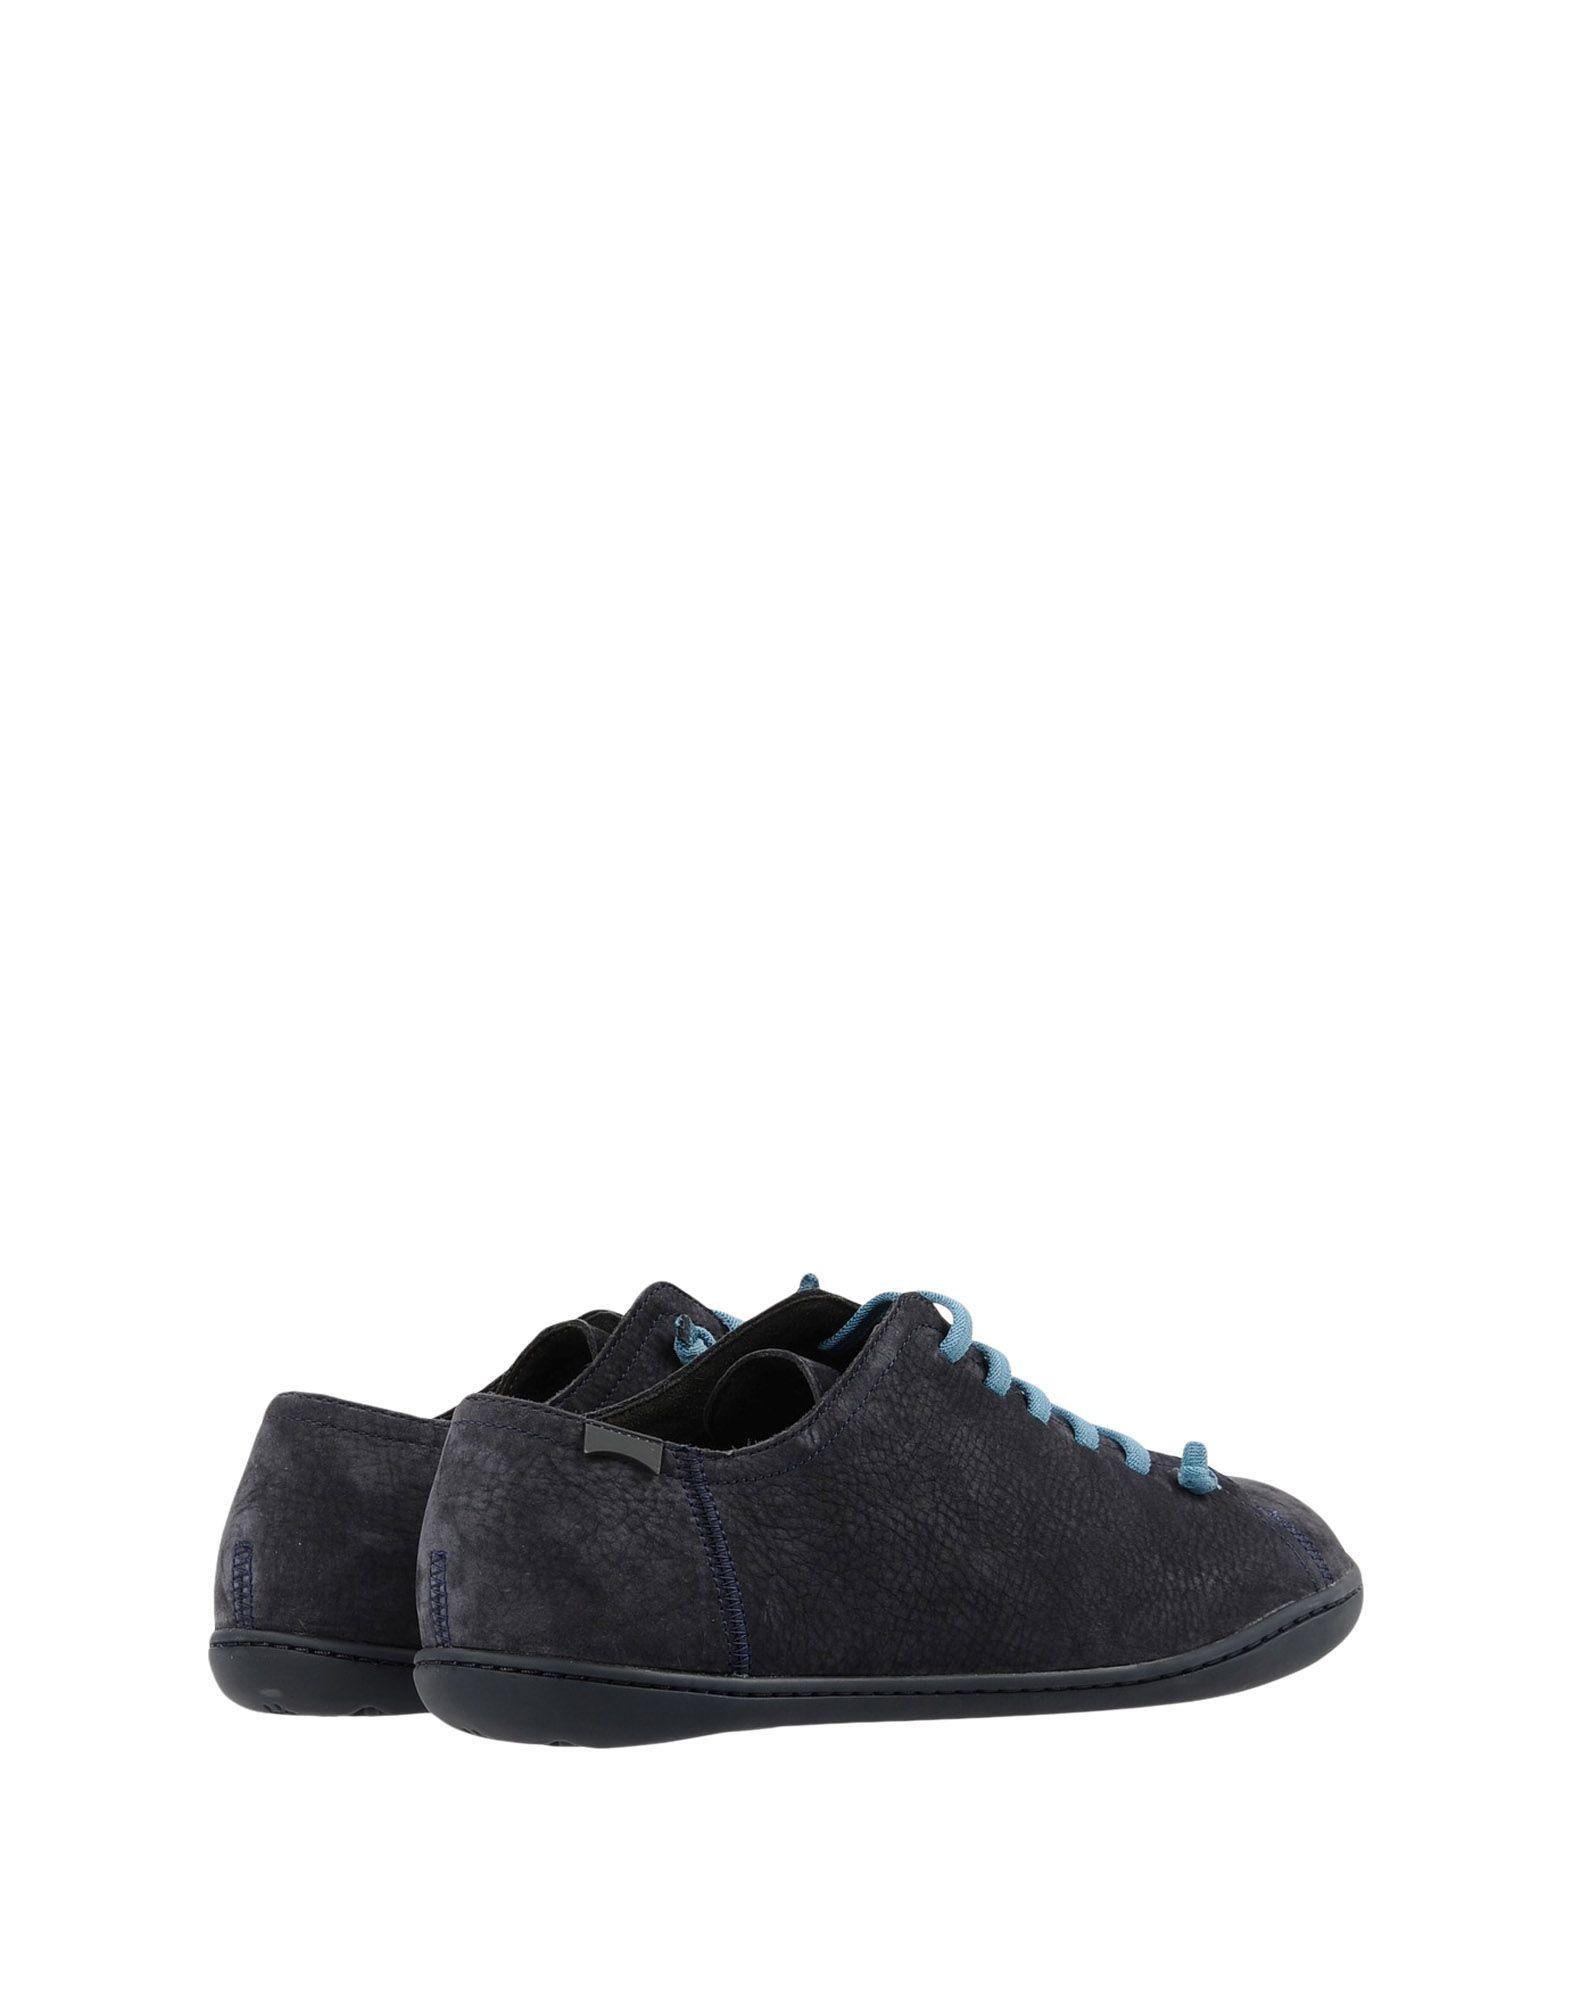 Camper Peu Cami  11435394XB Gute Qualität beliebte Schuhe